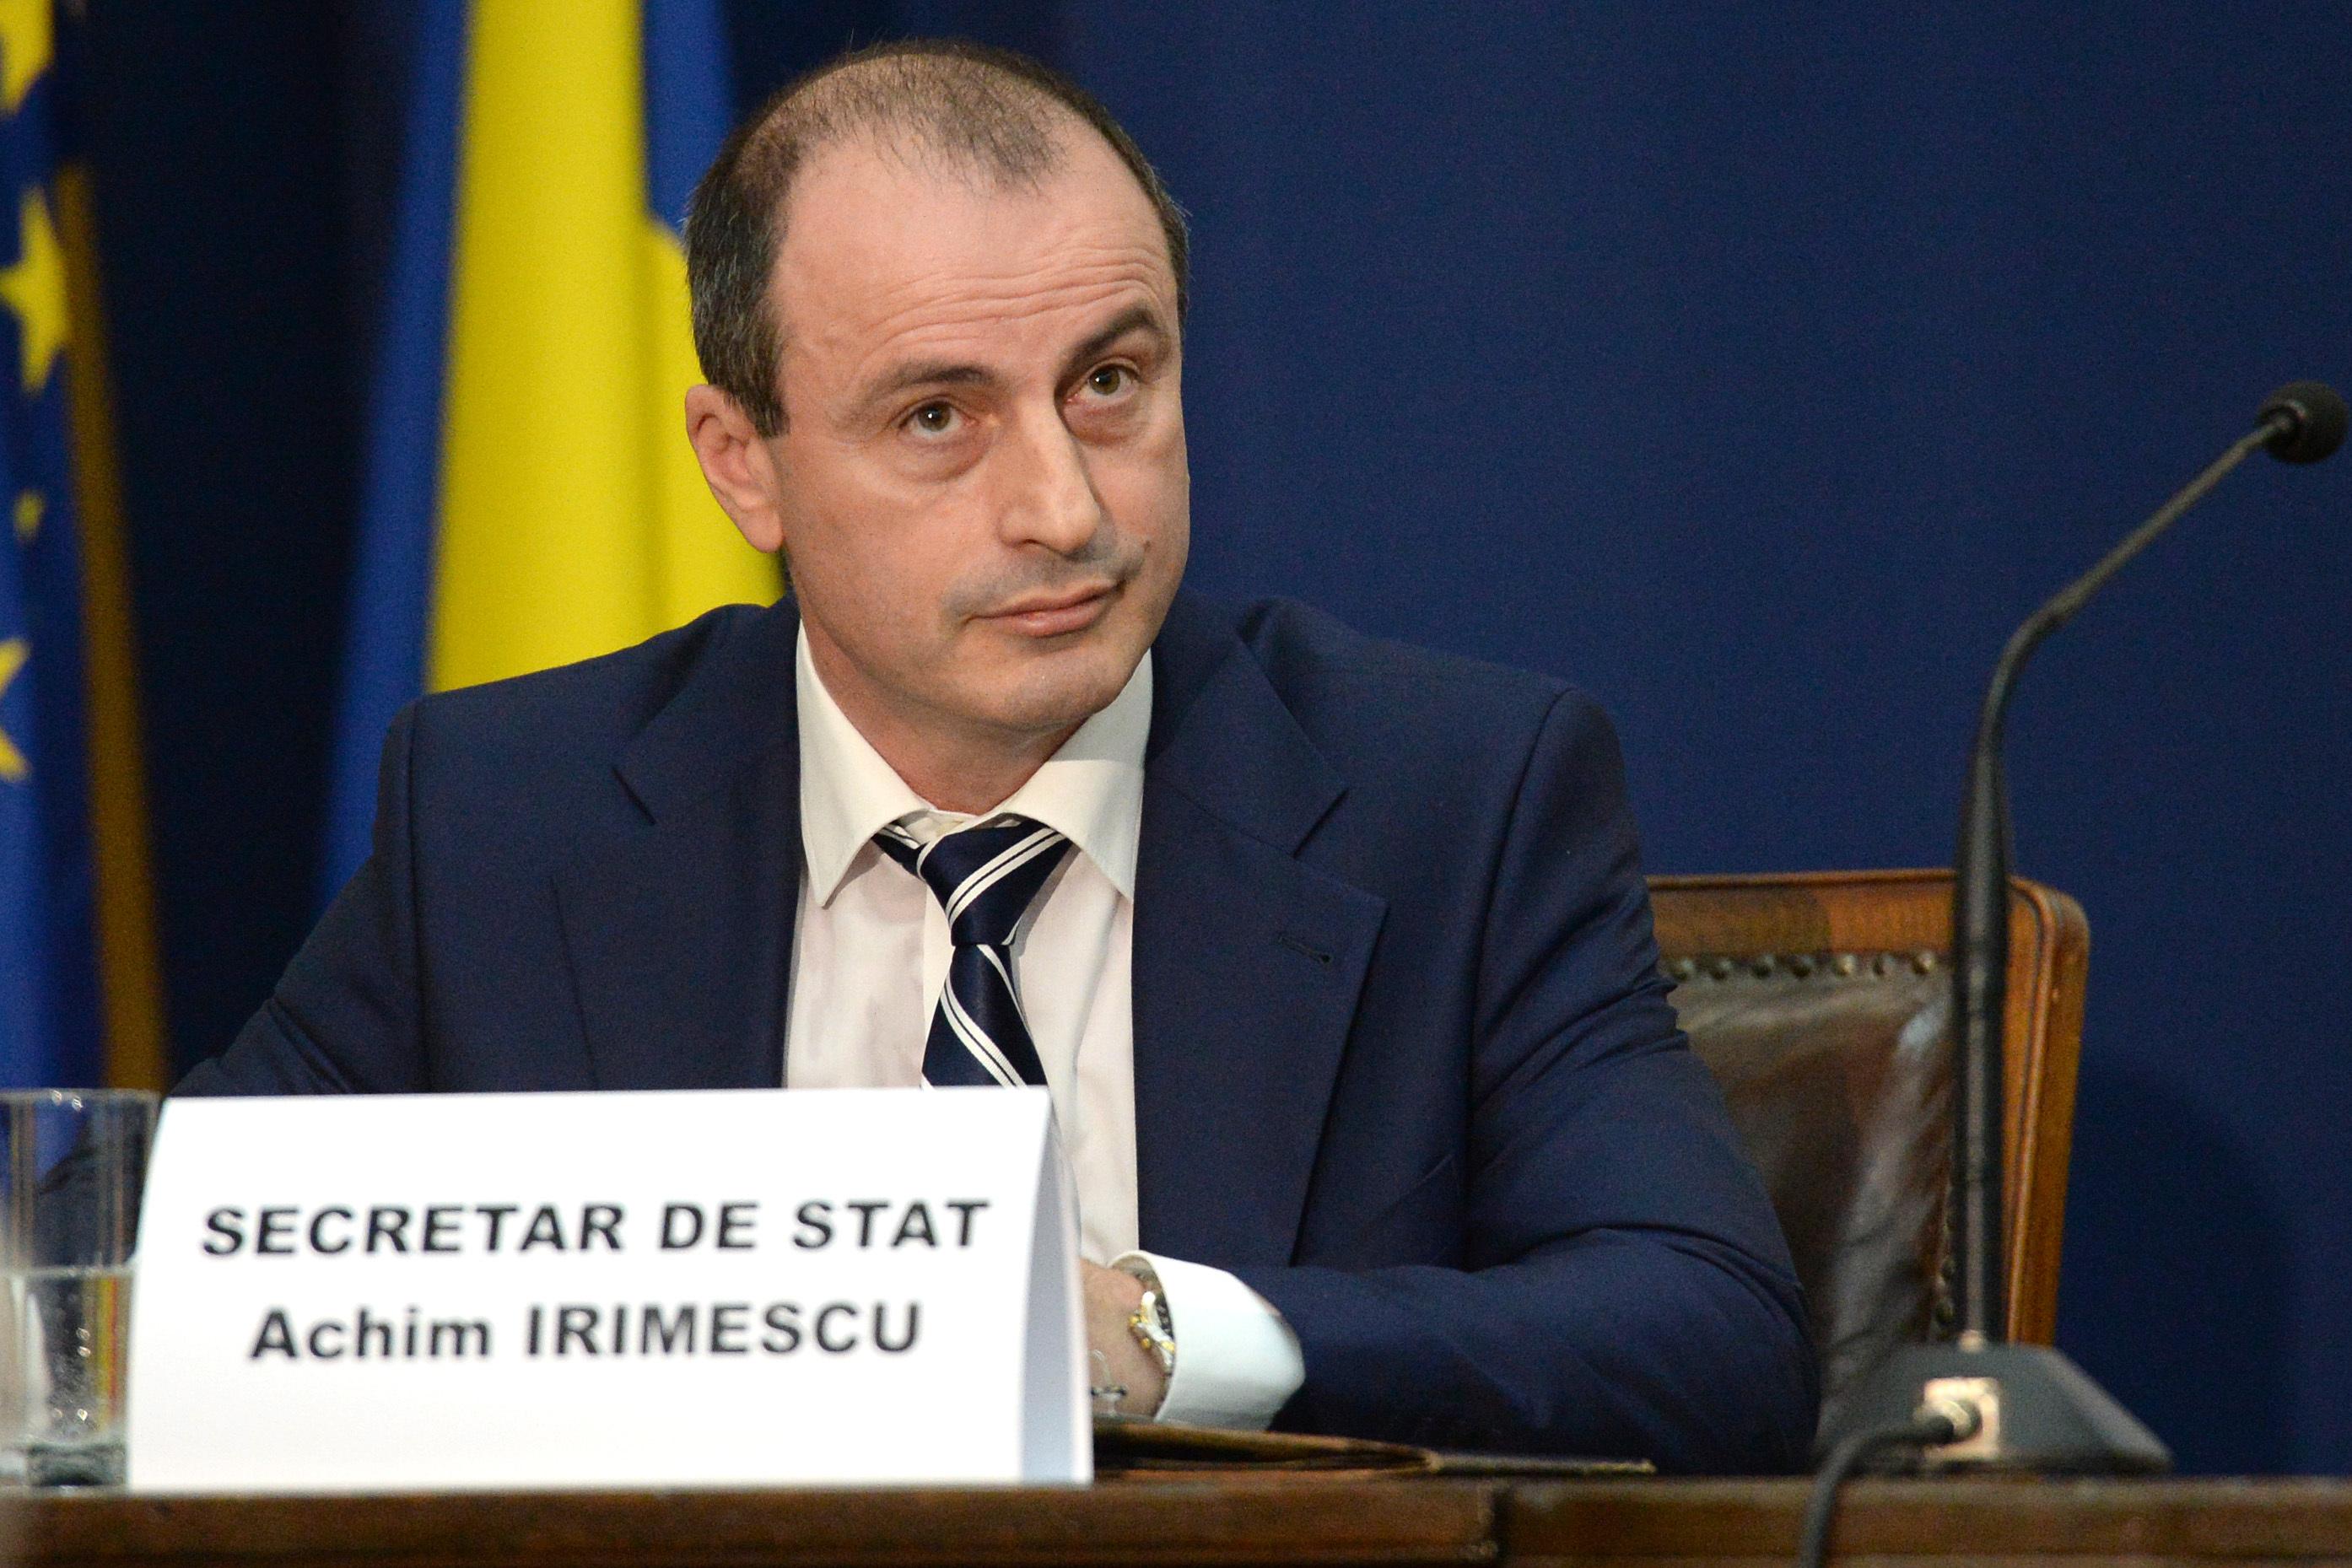 Achim Irimescu, noul ministru al Agriculturii, a fost secretar de stat in guvernele Ponta